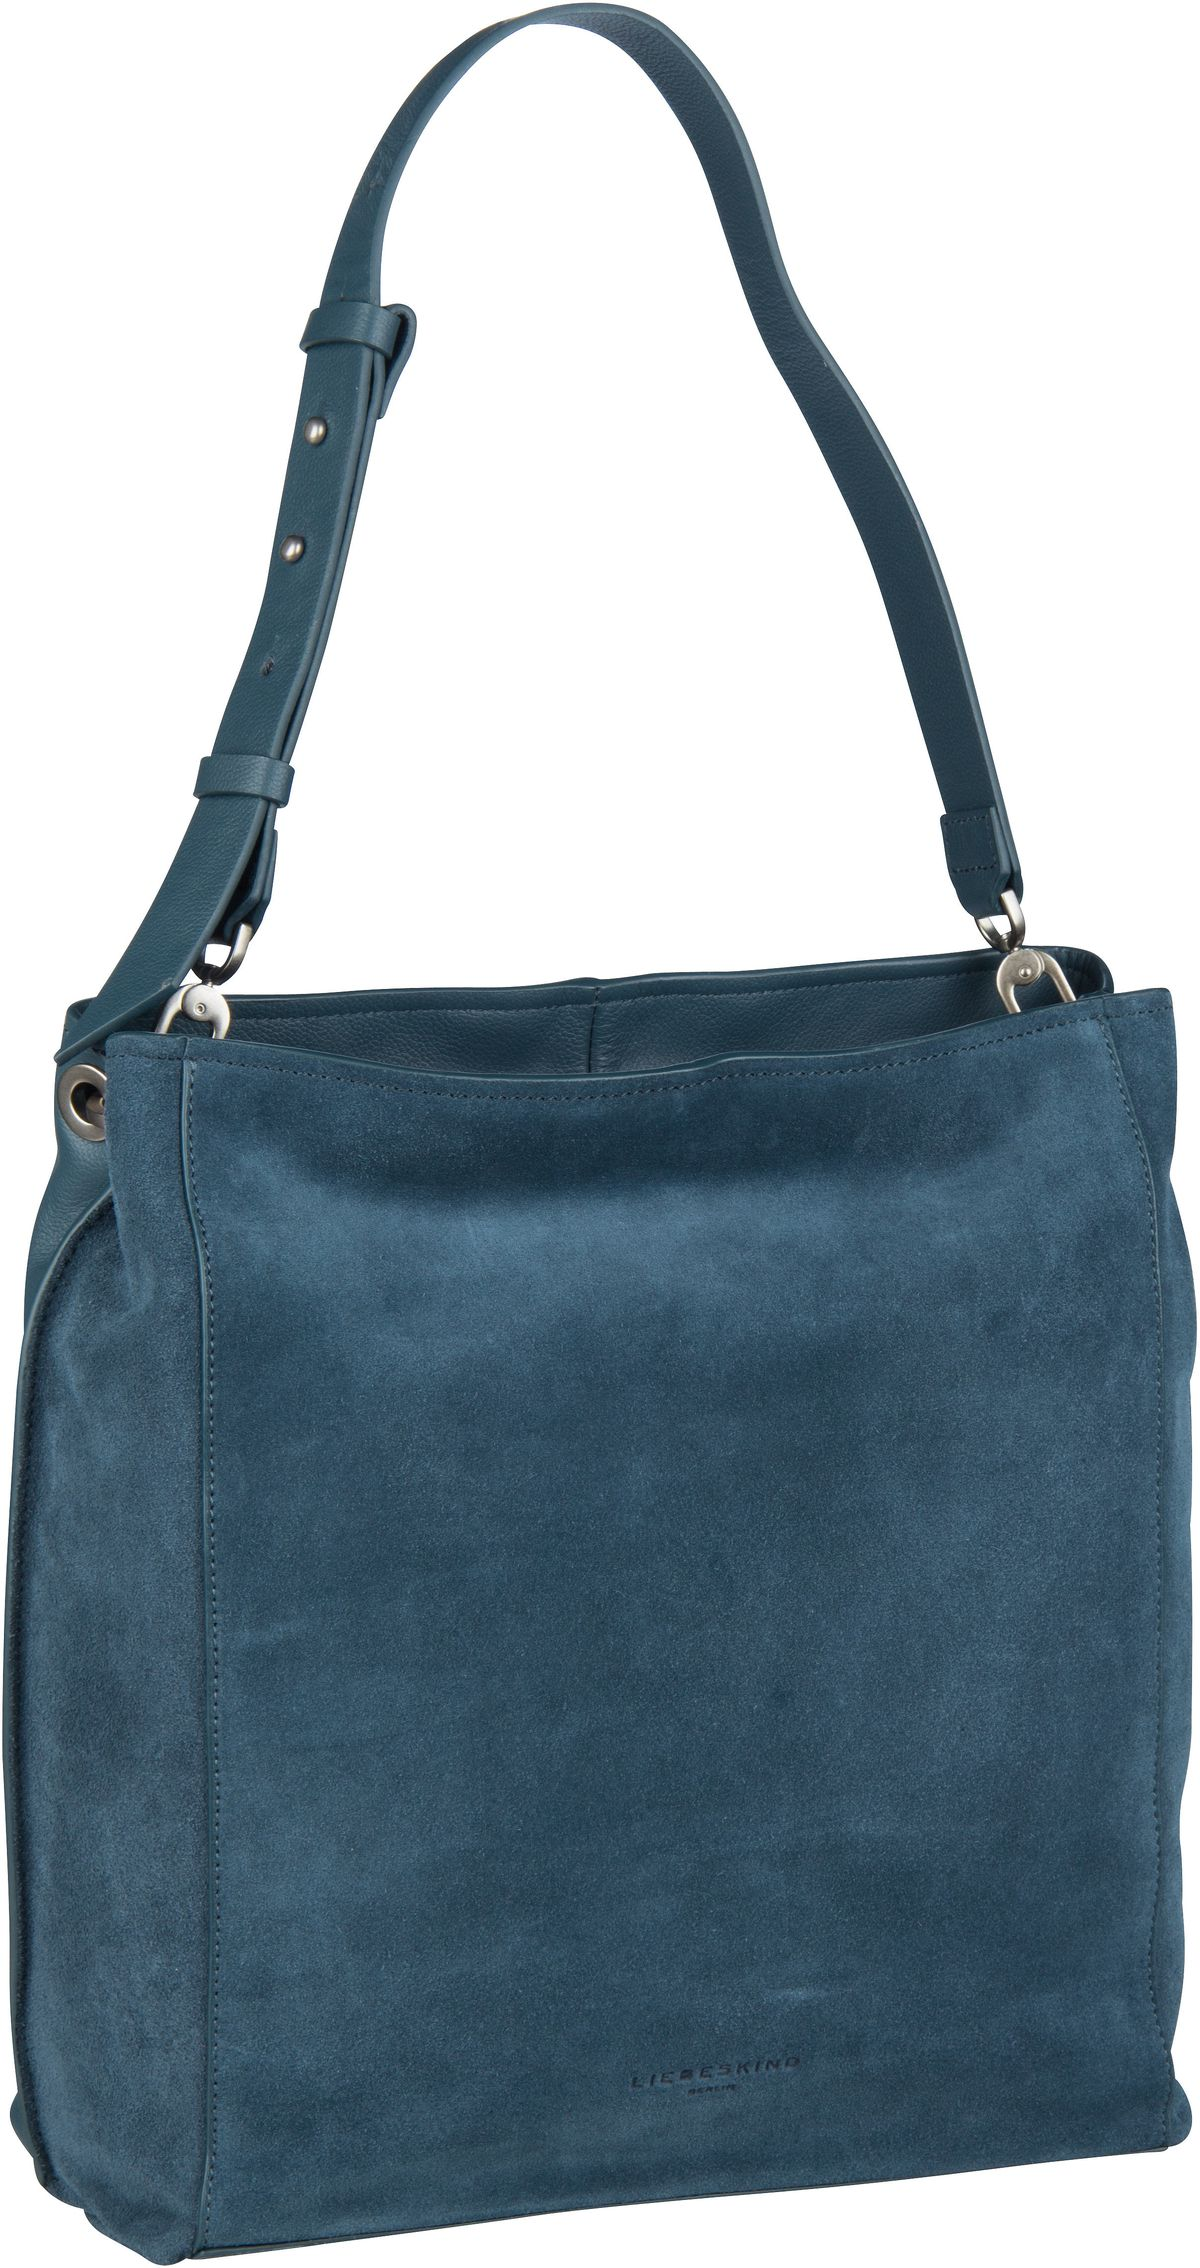 Berlin Handtasche Scouri 2 Hobo M China Blue